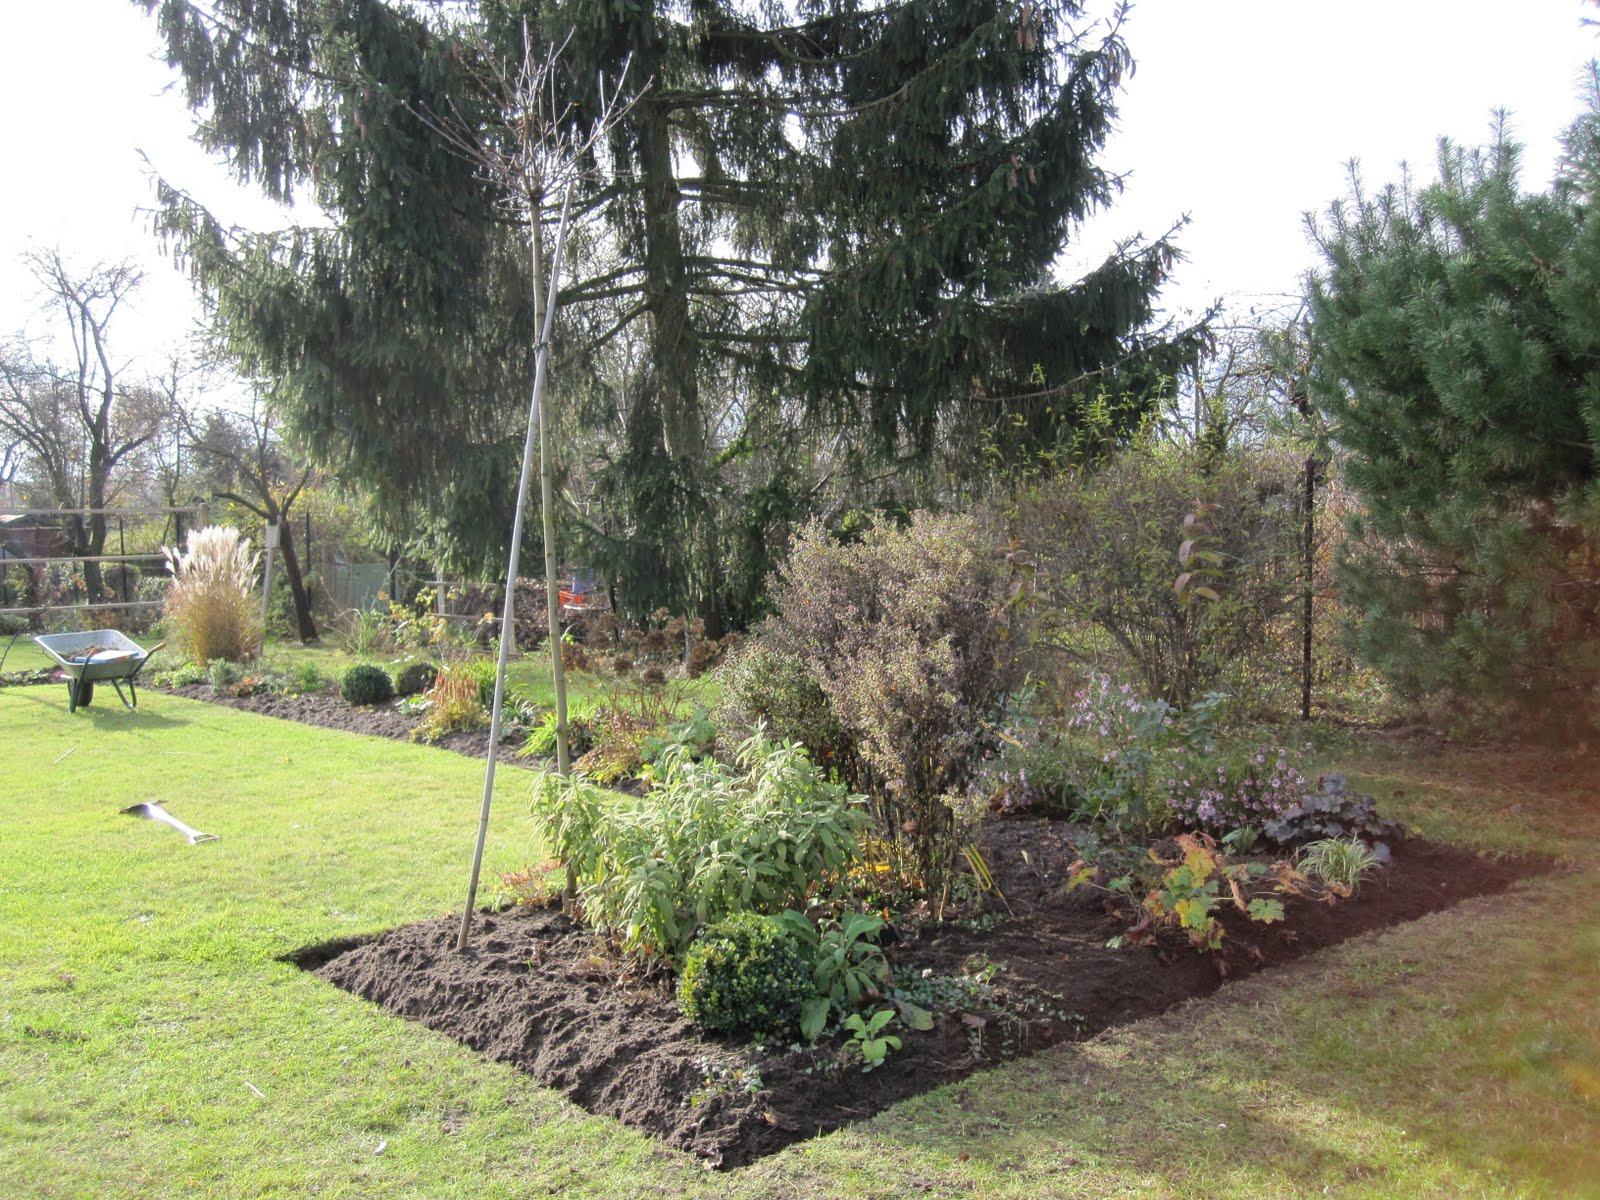 Gartenglück im Wandelgarten: 2009